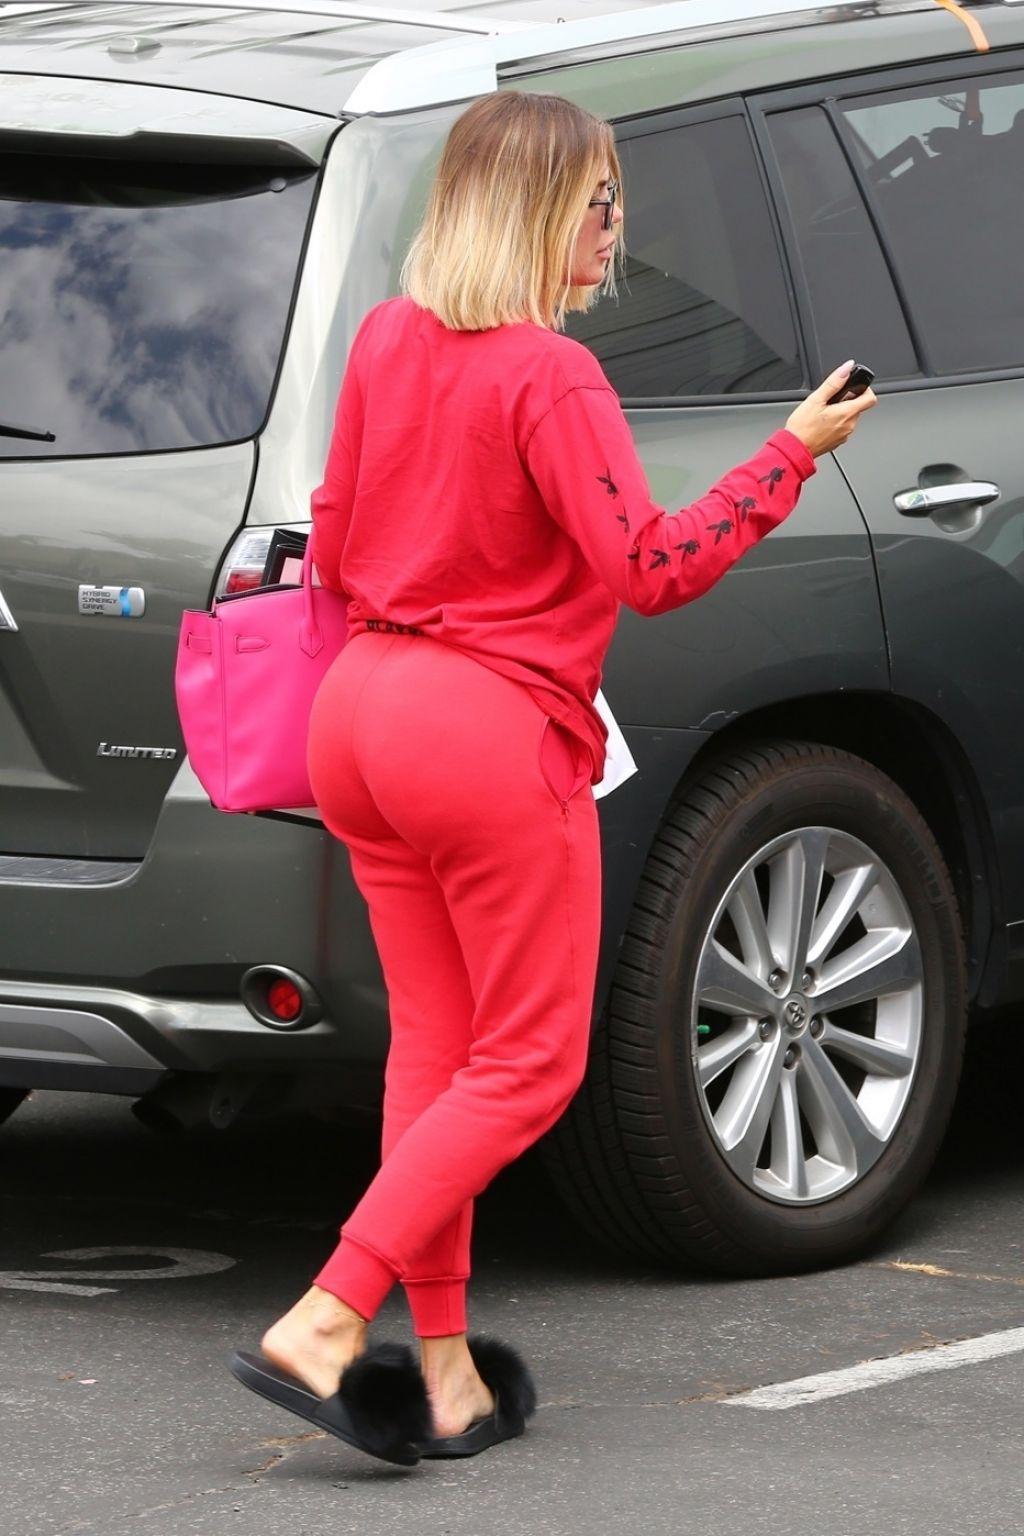 Khloe Kardashian Ass In Tight Jeans